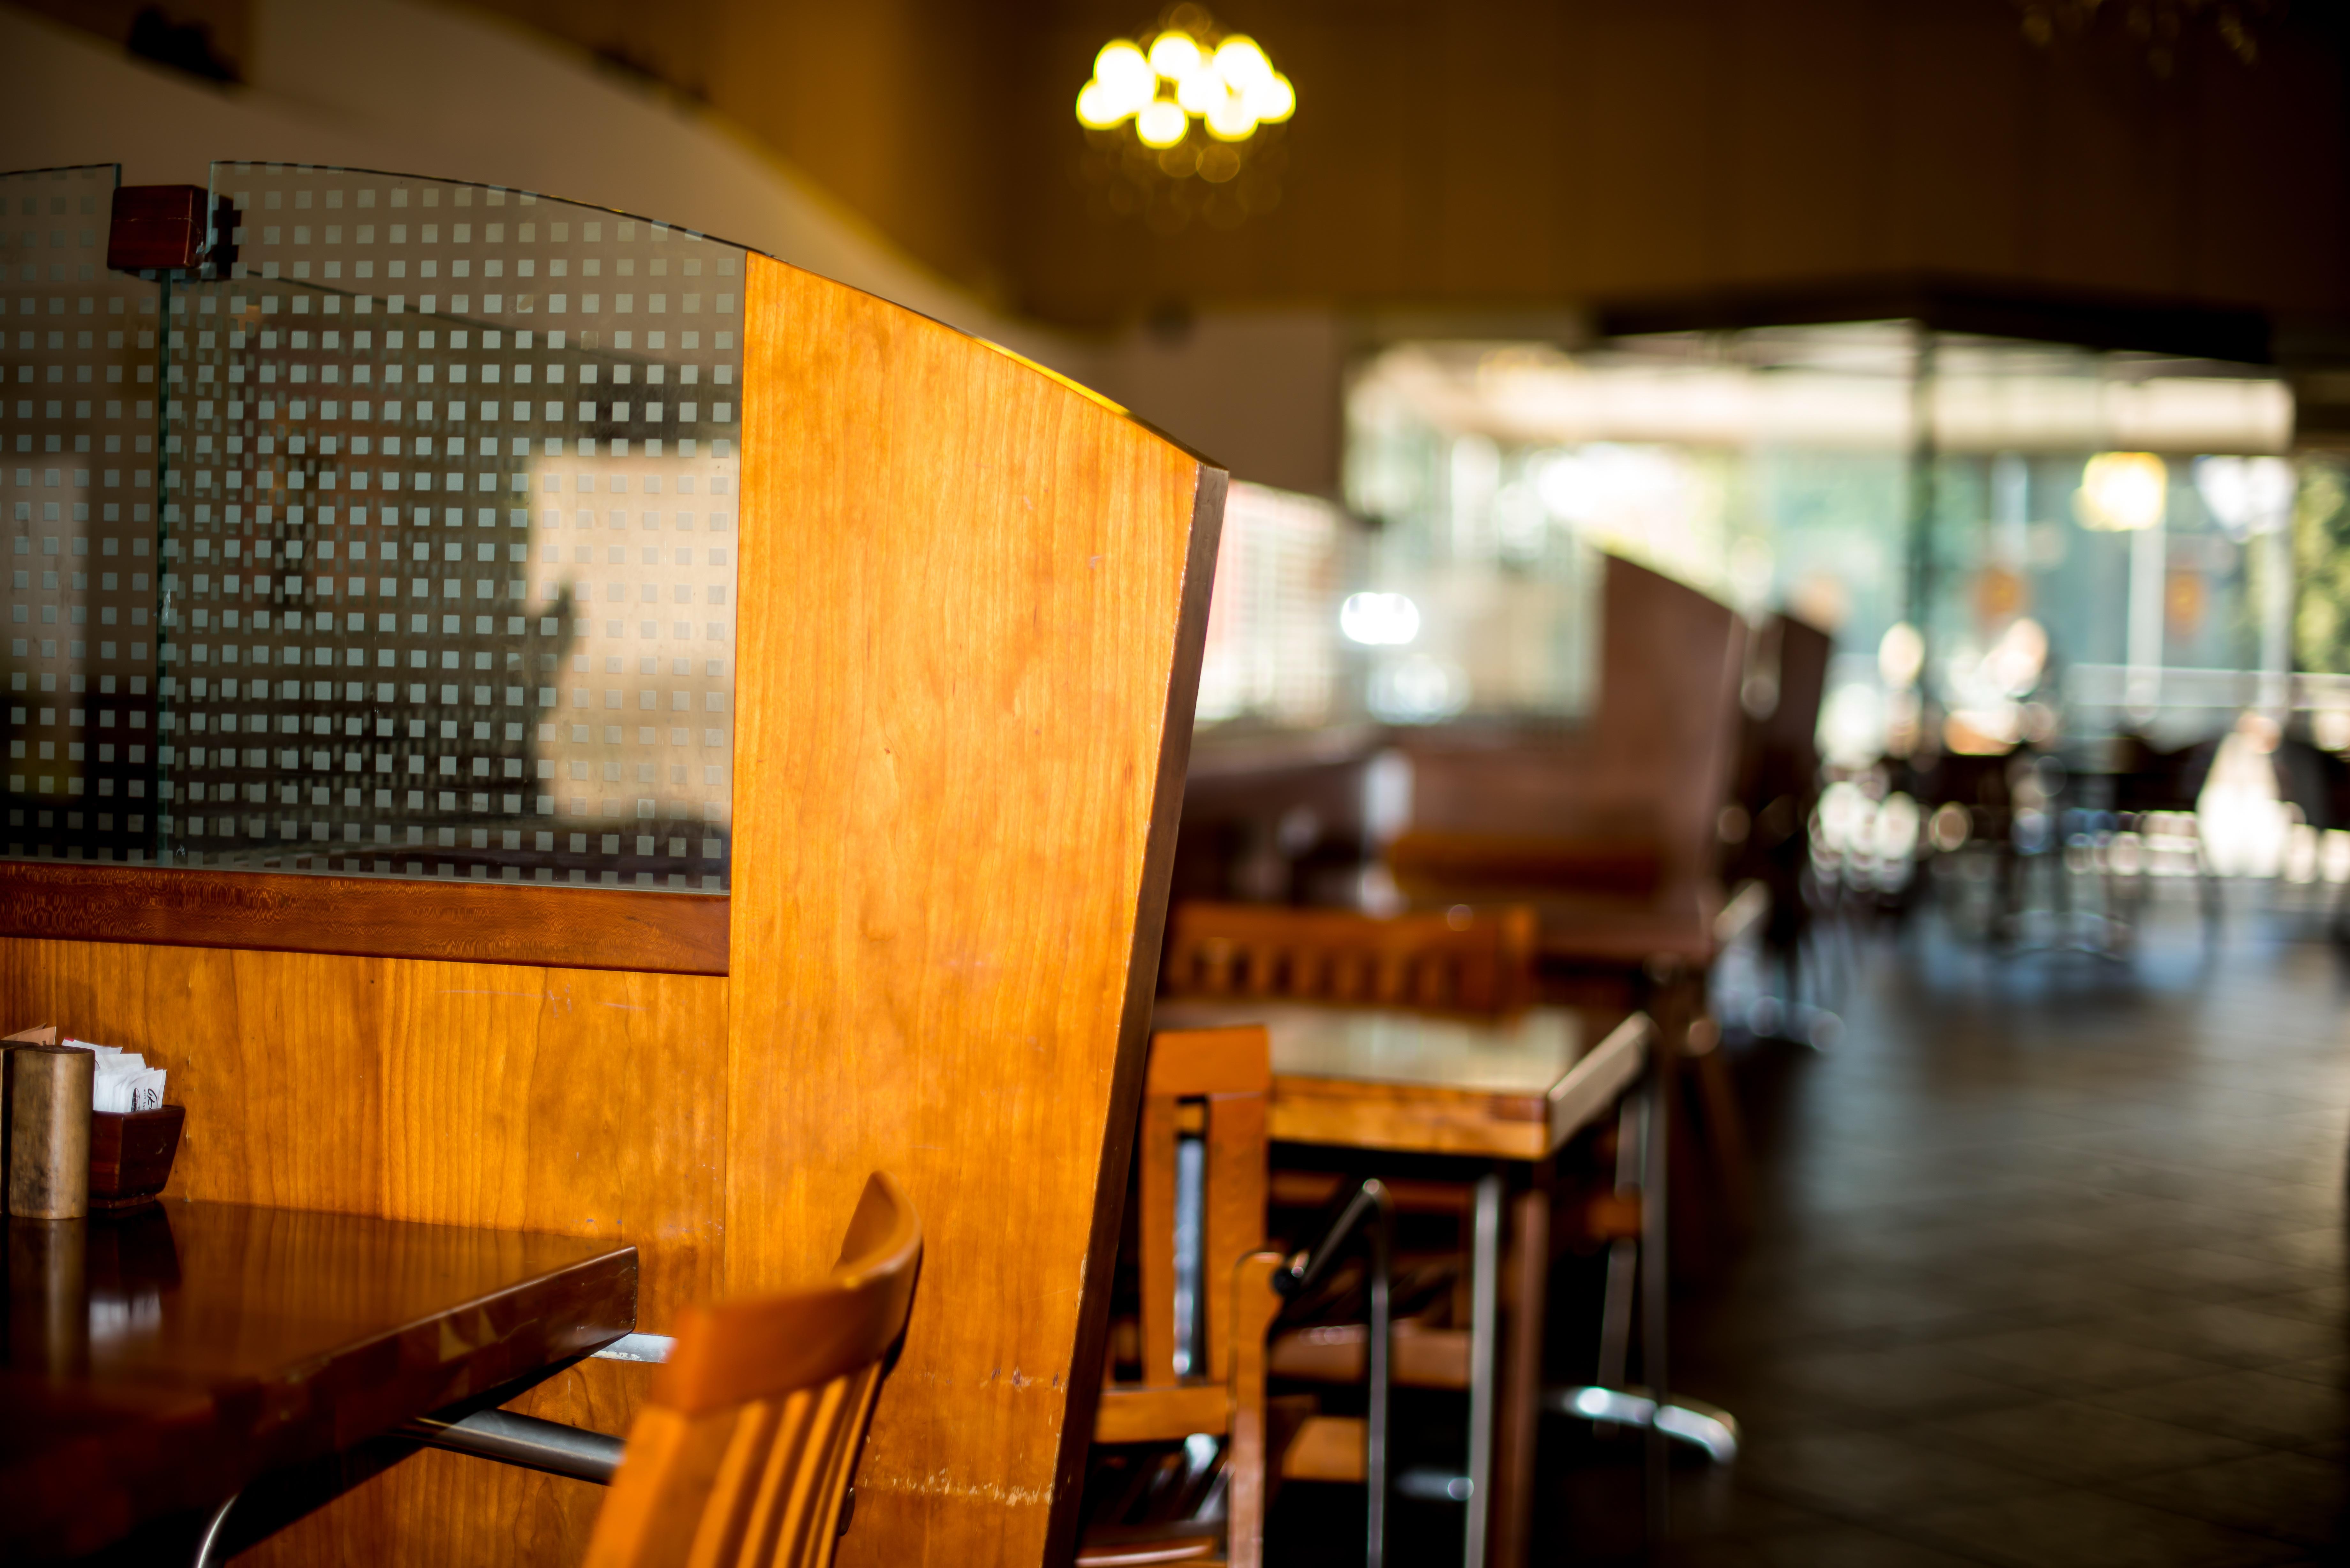 Table Chair Restaurant Bar Indoor Divider Empty Furniture Room Modern  Luxury Dining Service Elegance